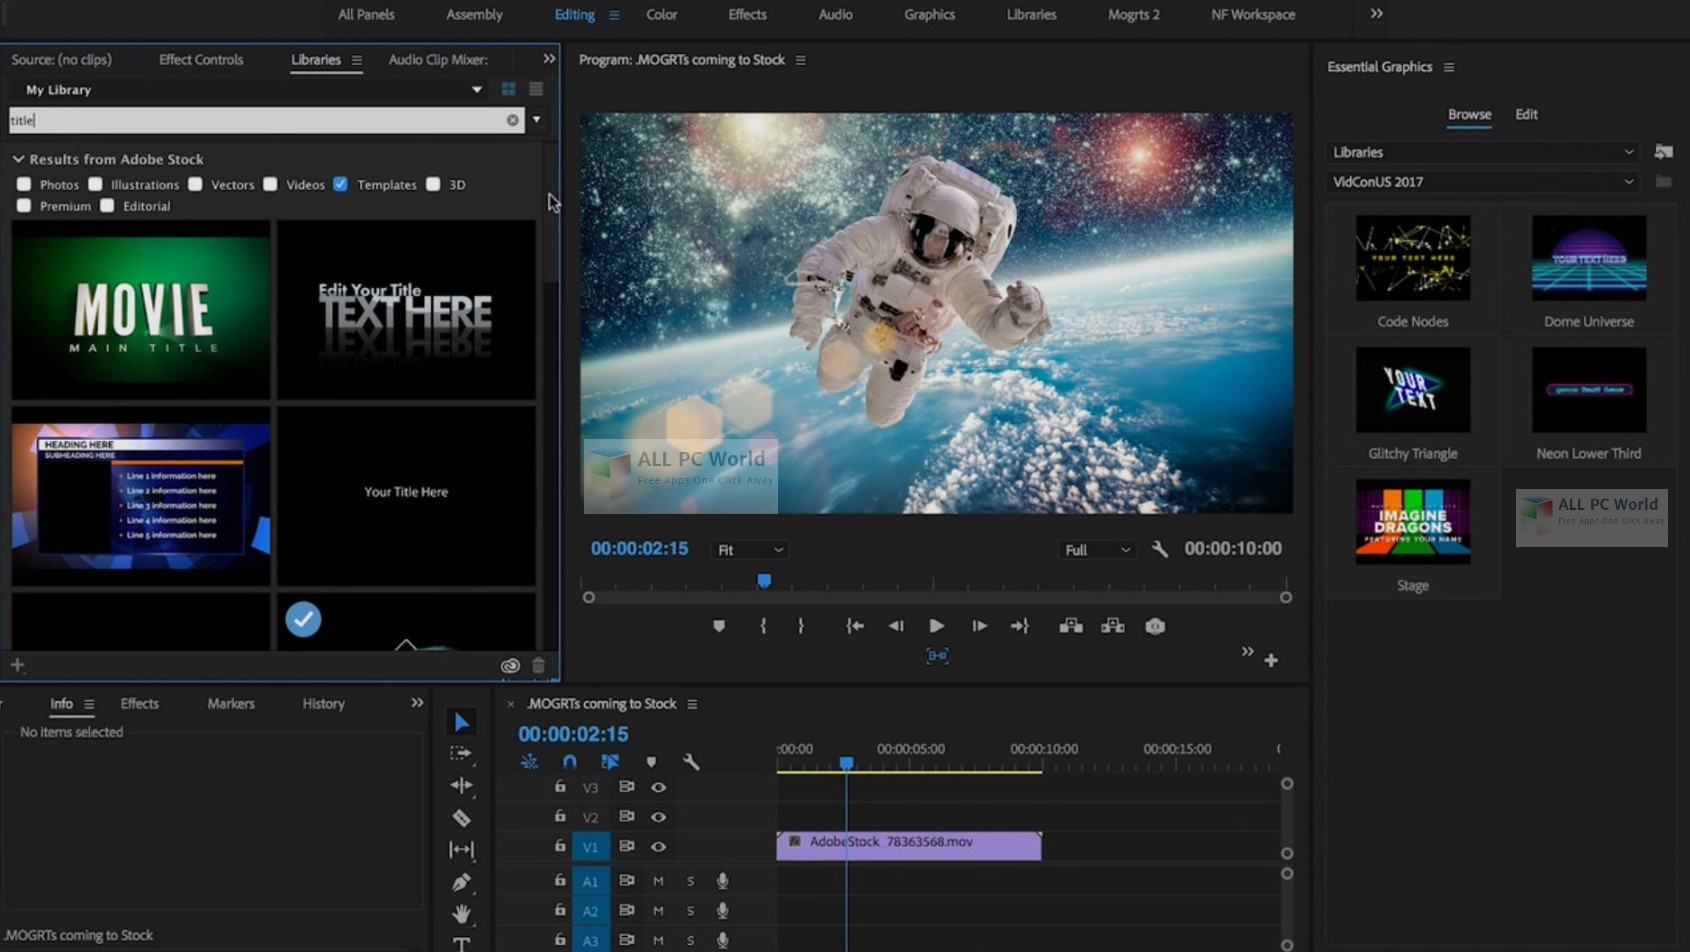 Adobe After Effects CC 2020 v17.0.6.35 Download